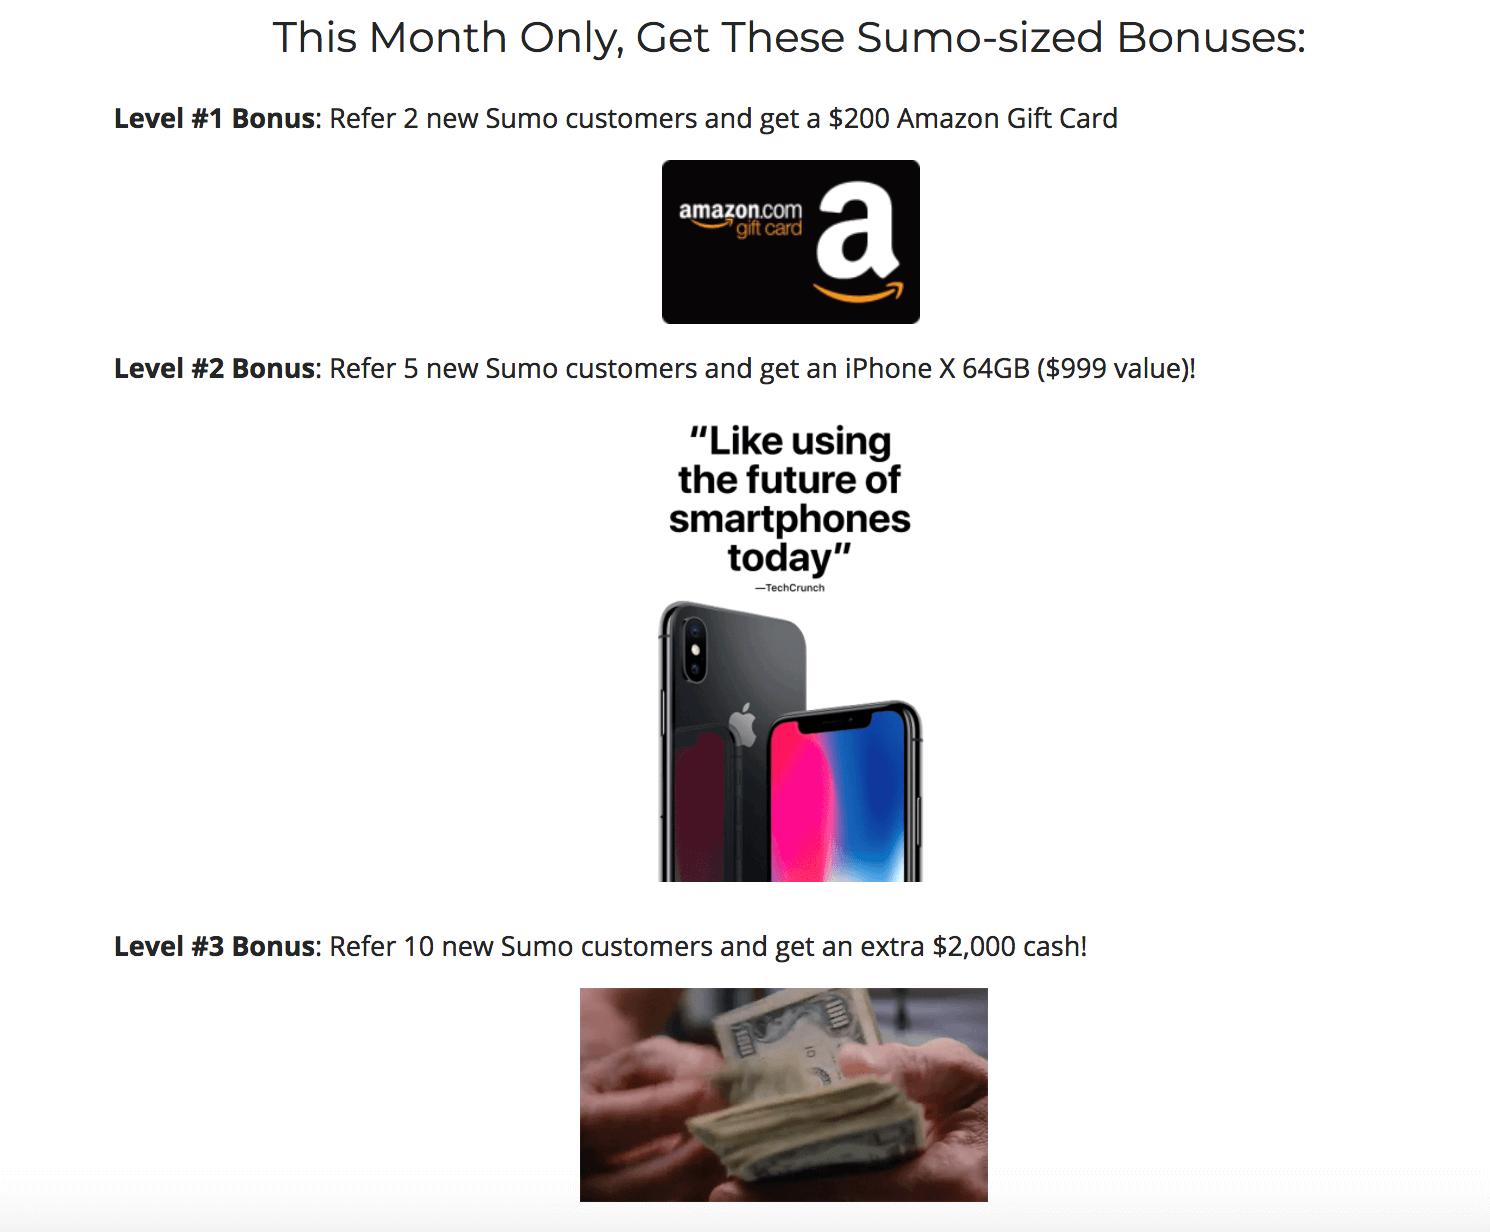 Screenshot showing reward bonuses for a certain month